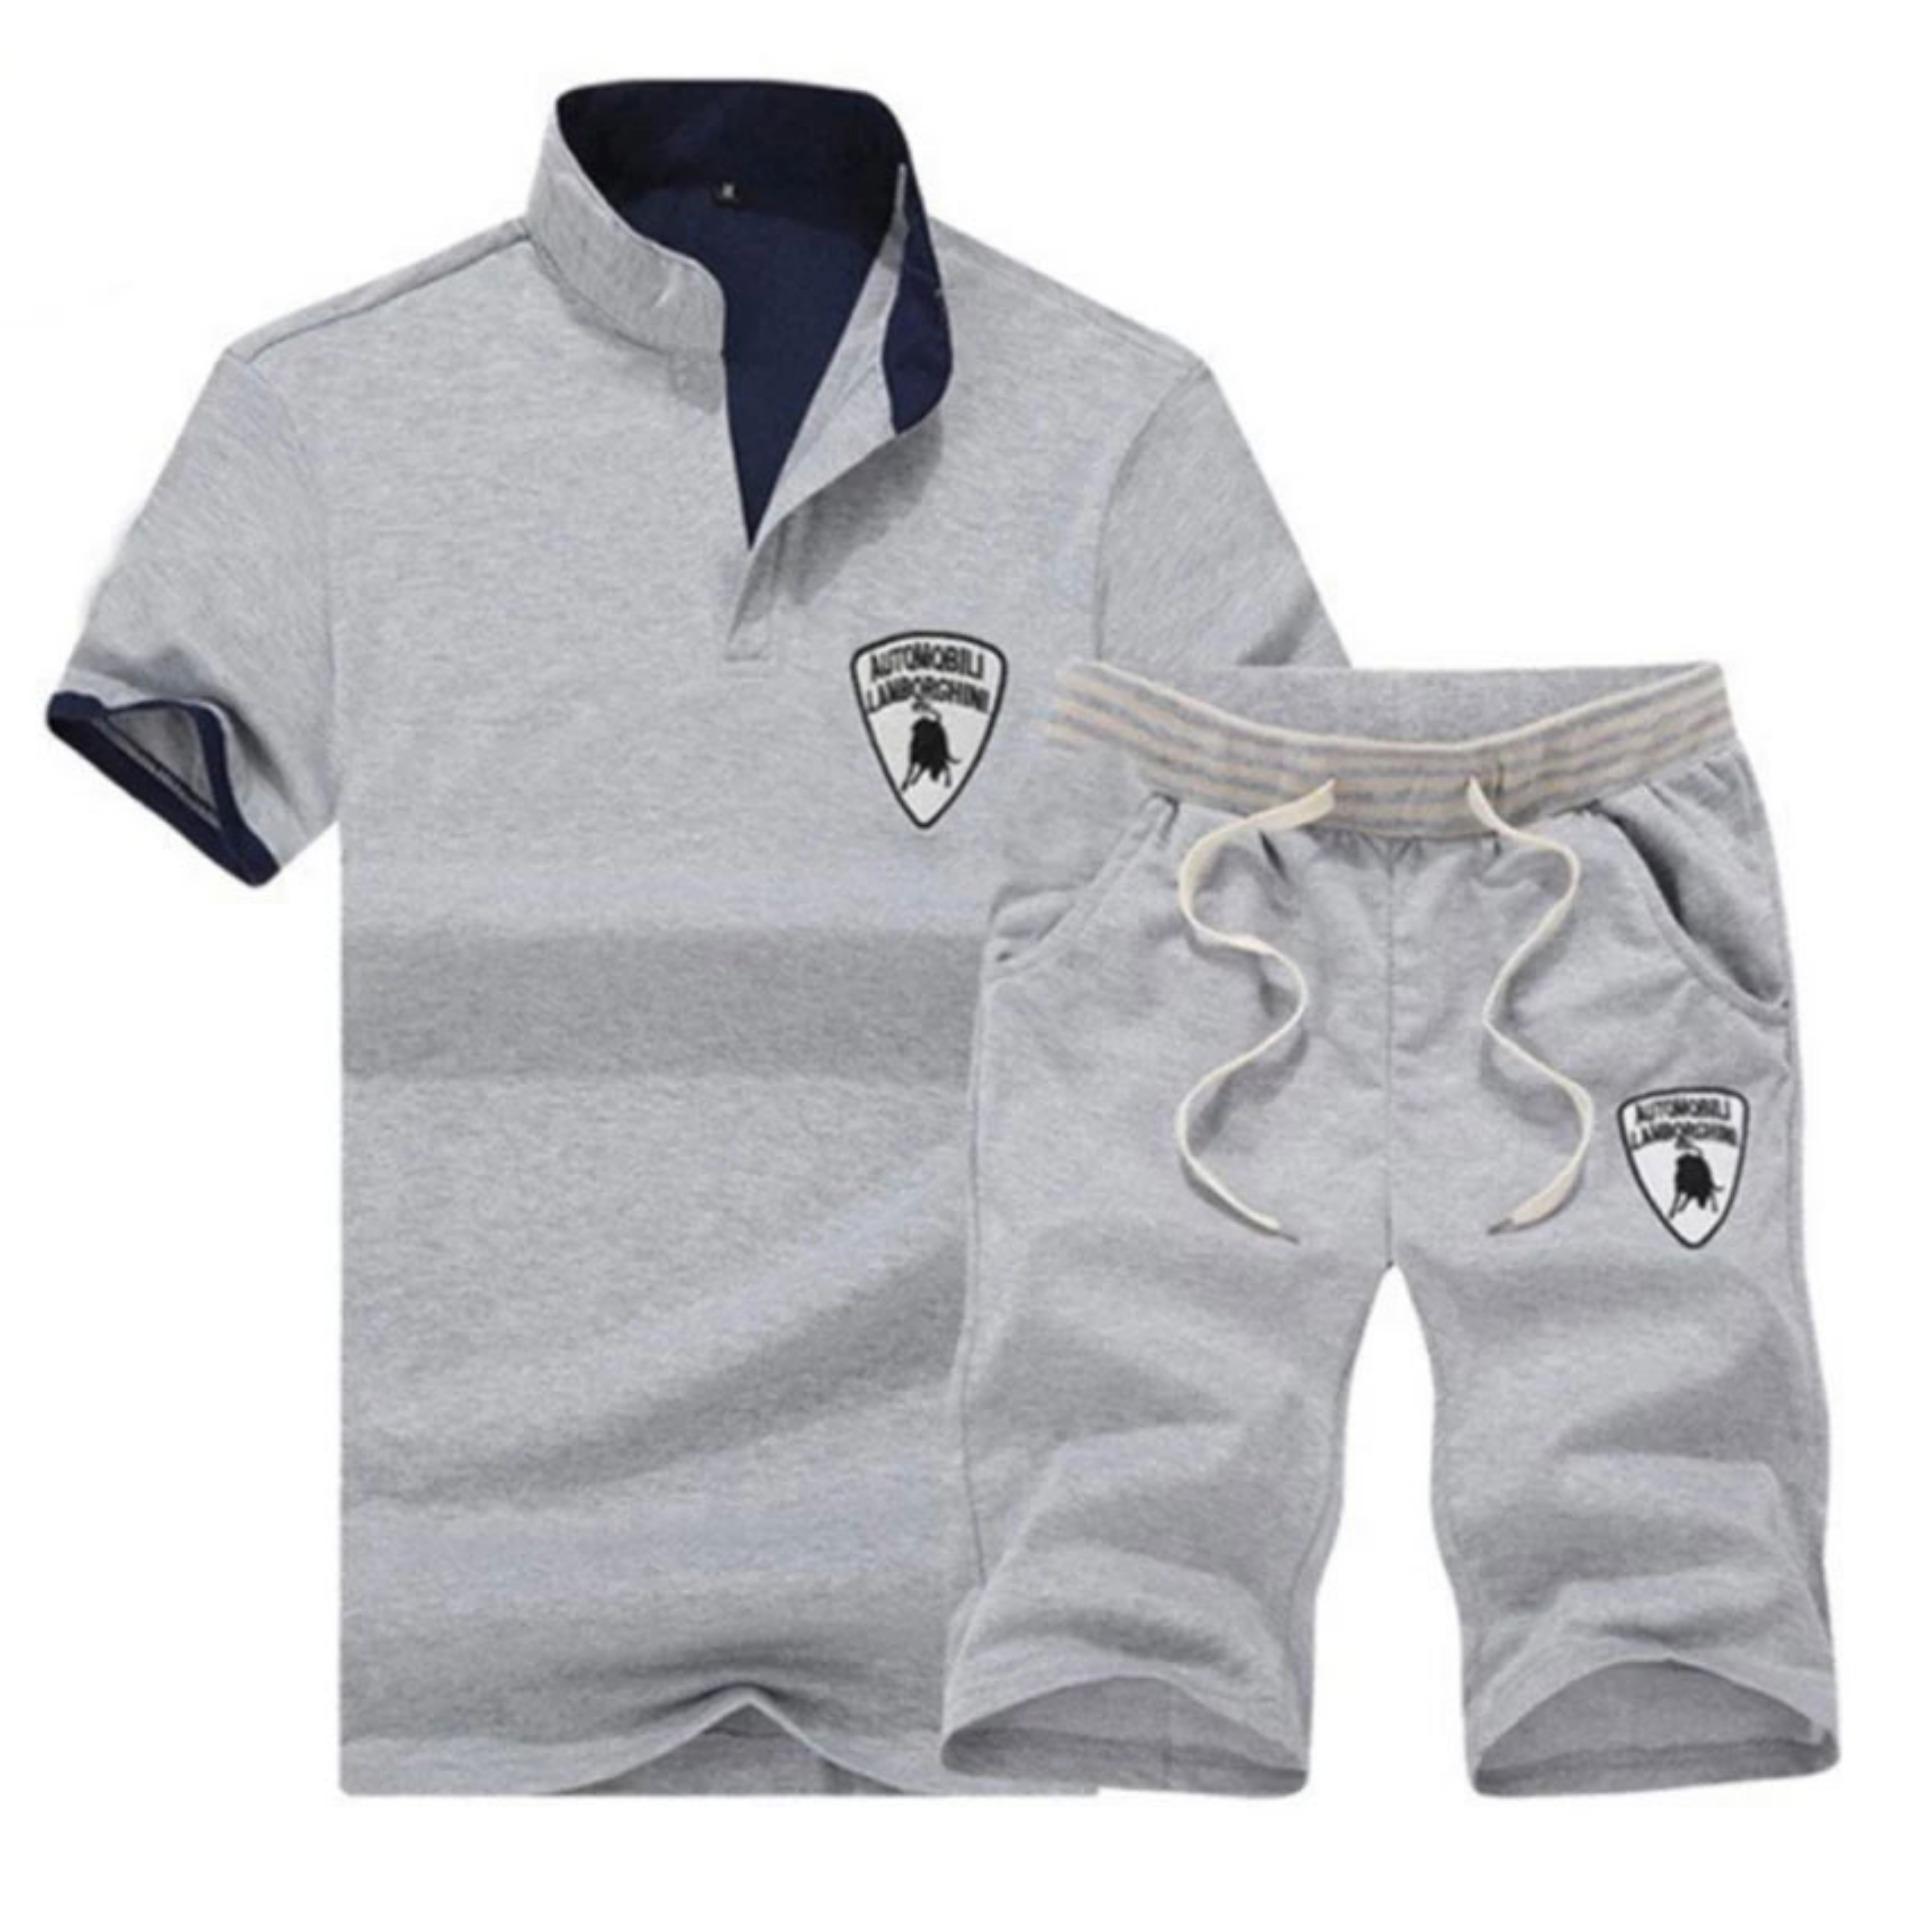 Man Setelan sweater Cepat Kering Kualitas Baik Musim Panas Pola Baru Laki-laki Rekreasi Pria Lengan Pendek Kasual Polo Shirt Set (abu-abu) -Intl